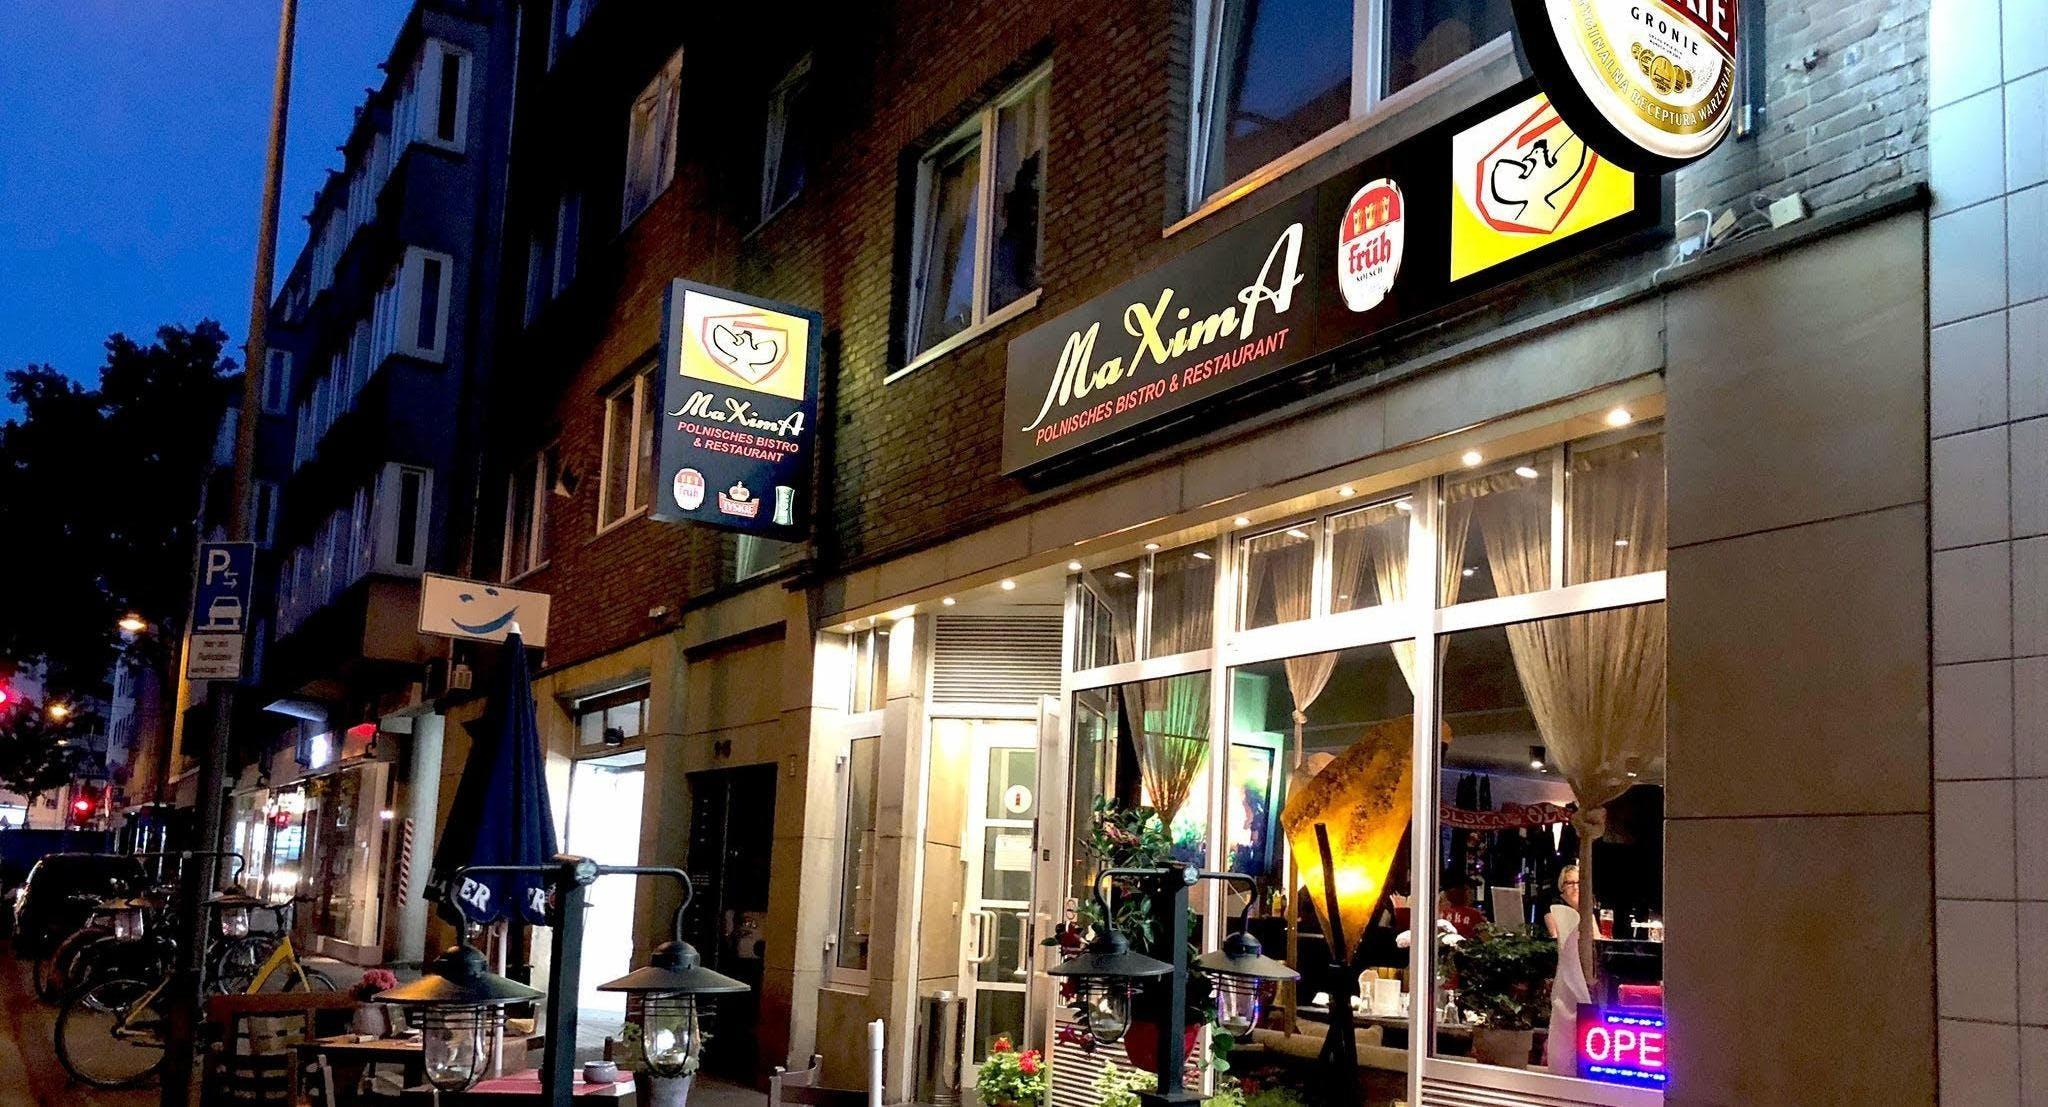 MaXimA Bistro & Restaurant Köln image 1